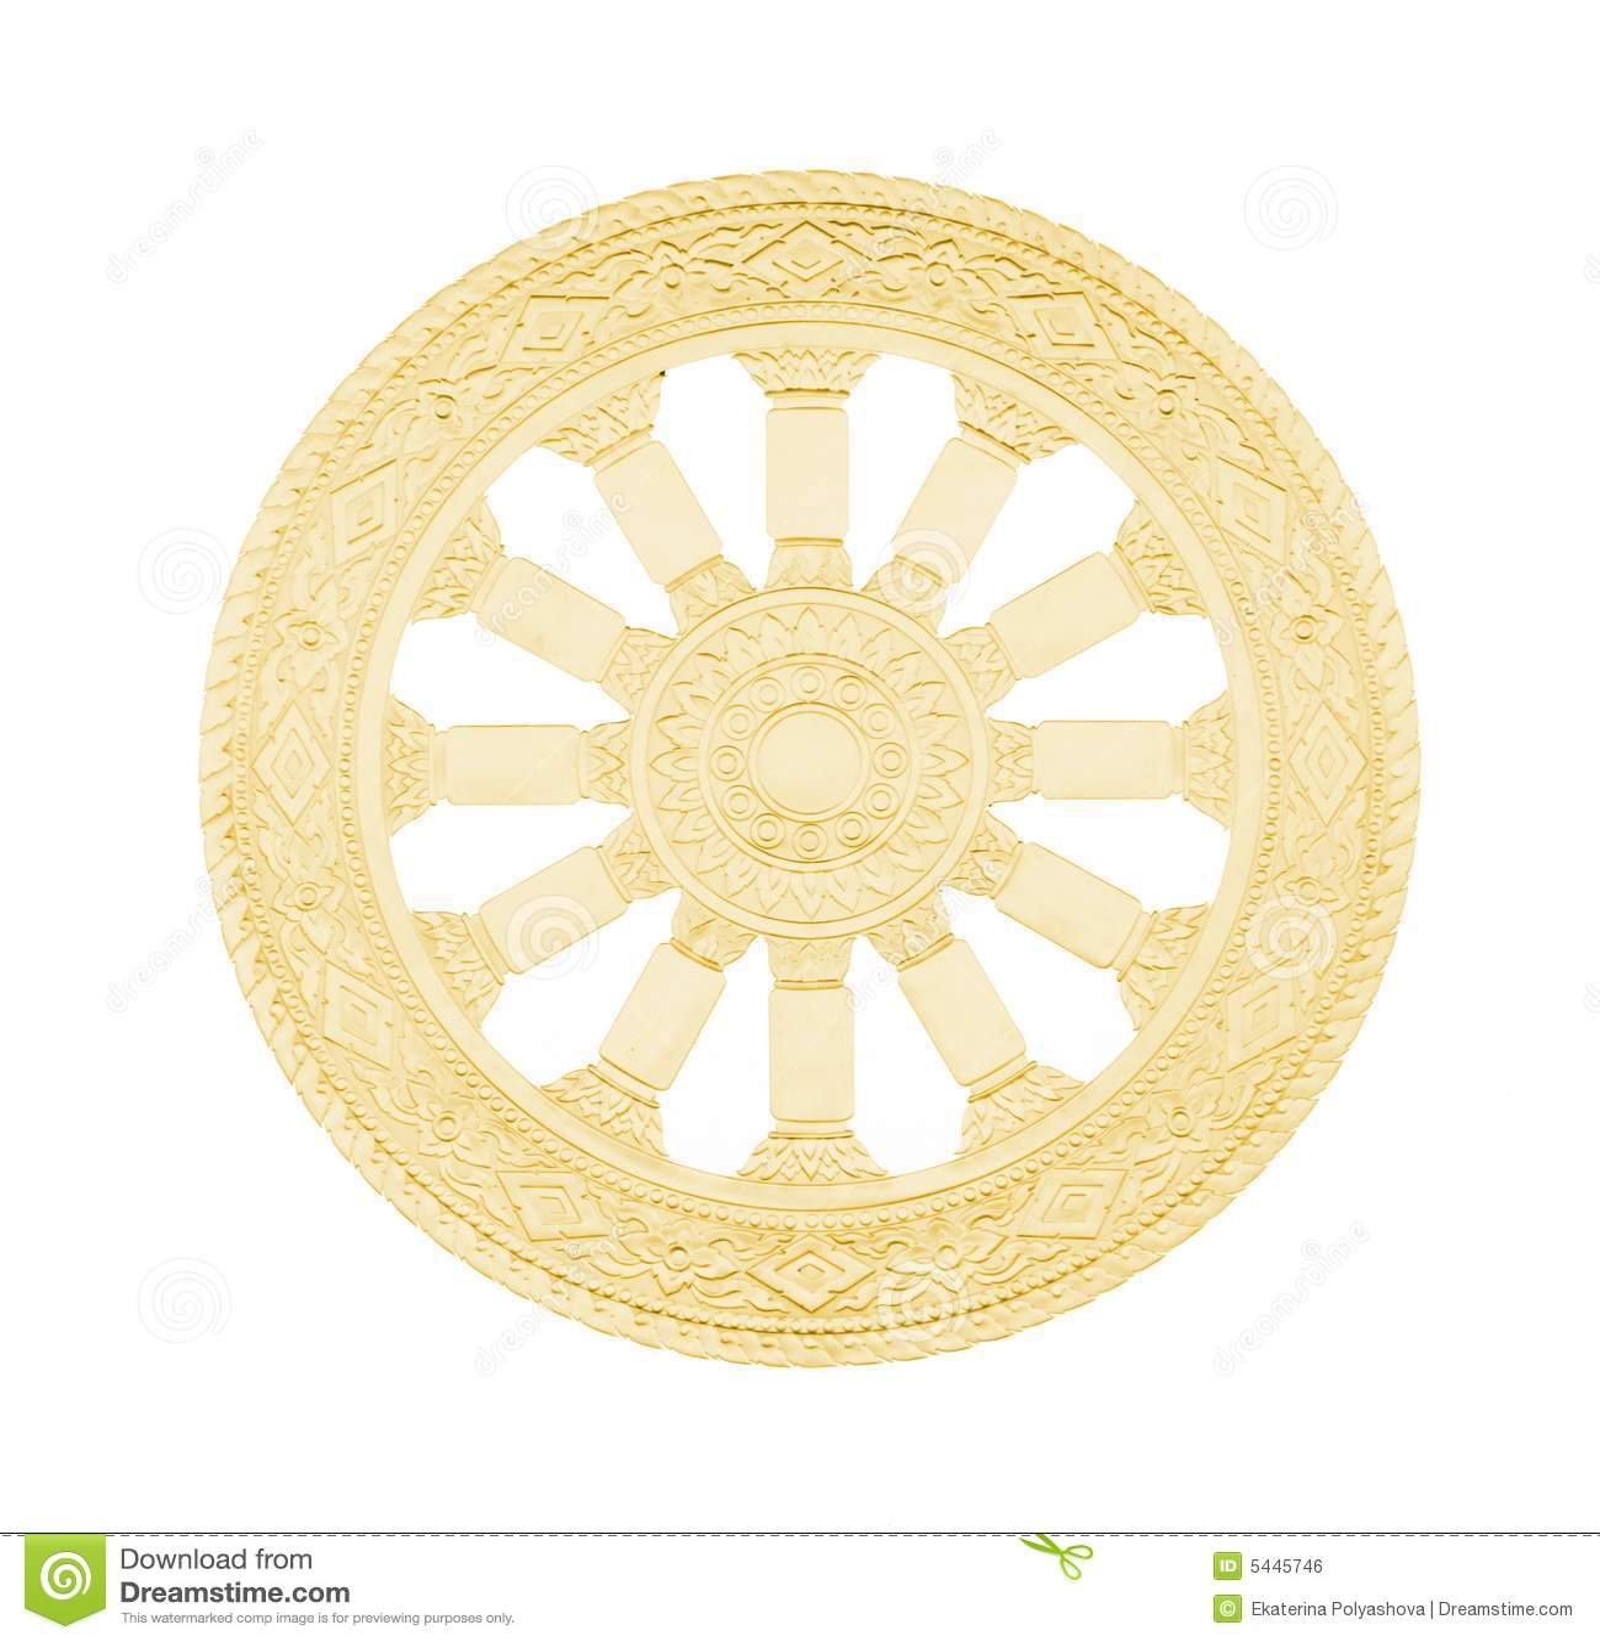 Buddhismus Symbol Rad Des Lebens Stockfoto Bild Von Religion